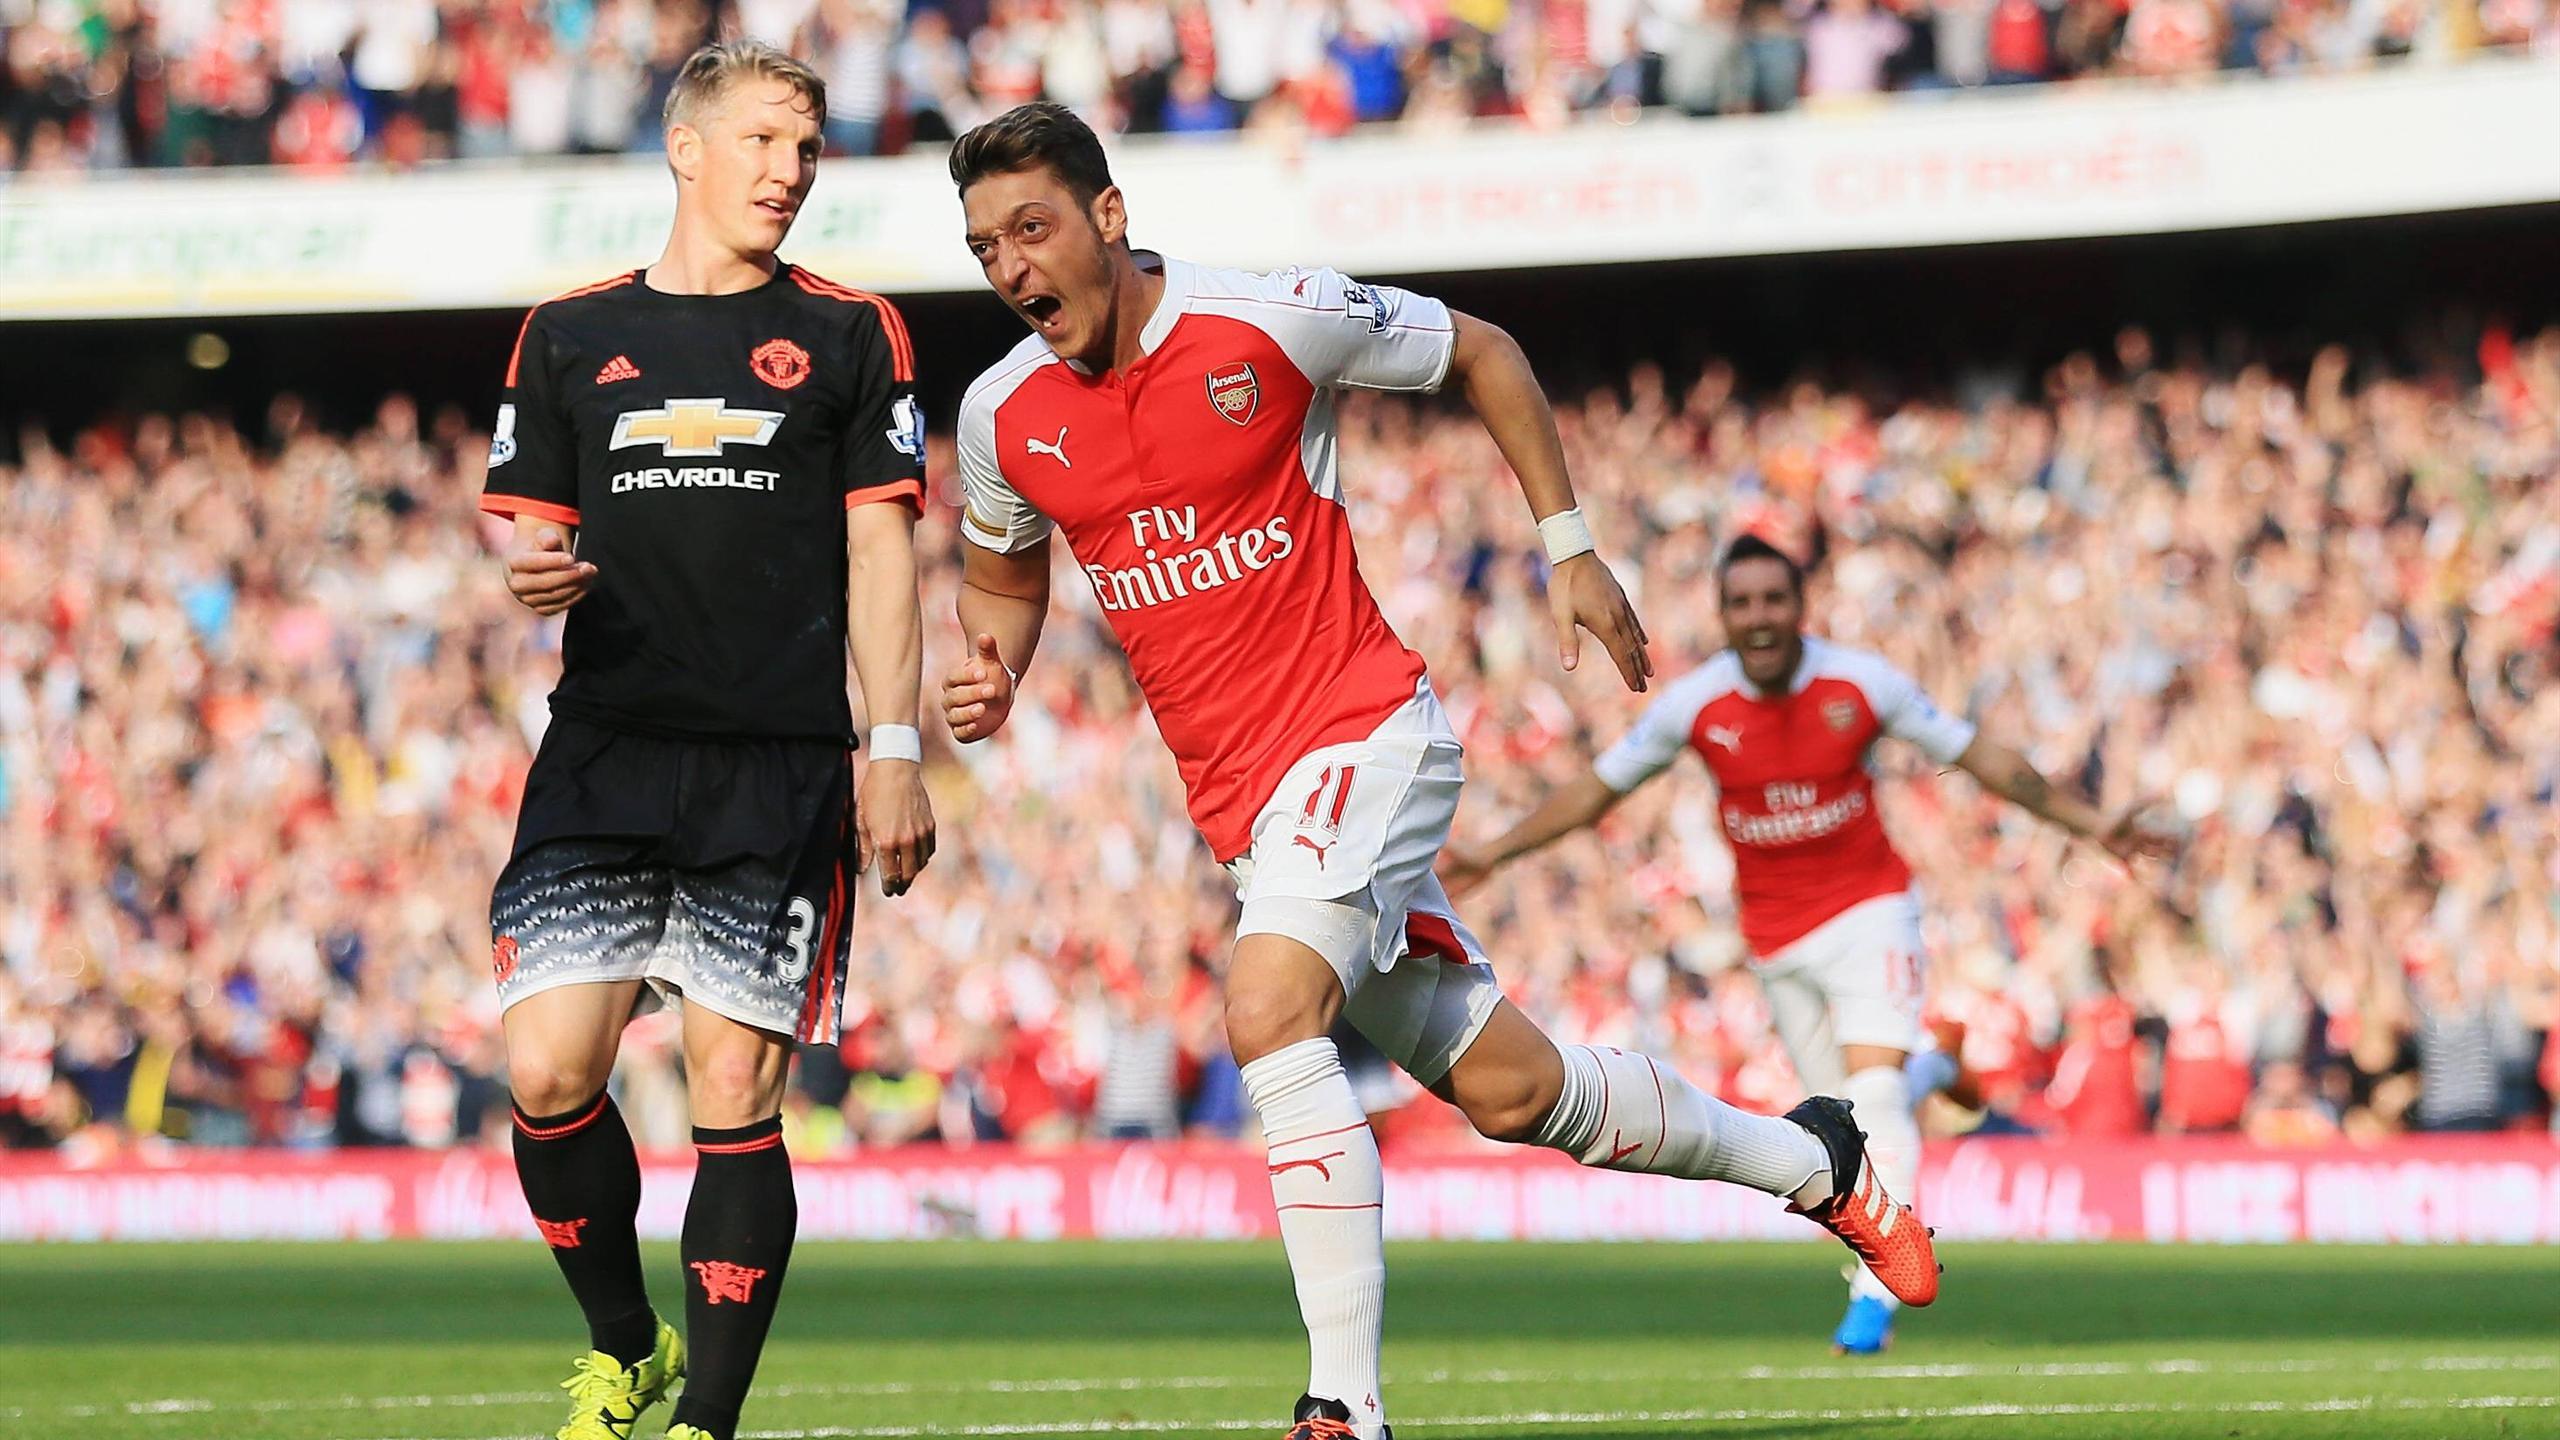 Bastian Schweinsteiger (Manchester United), Mesut Özil (Arsenal)